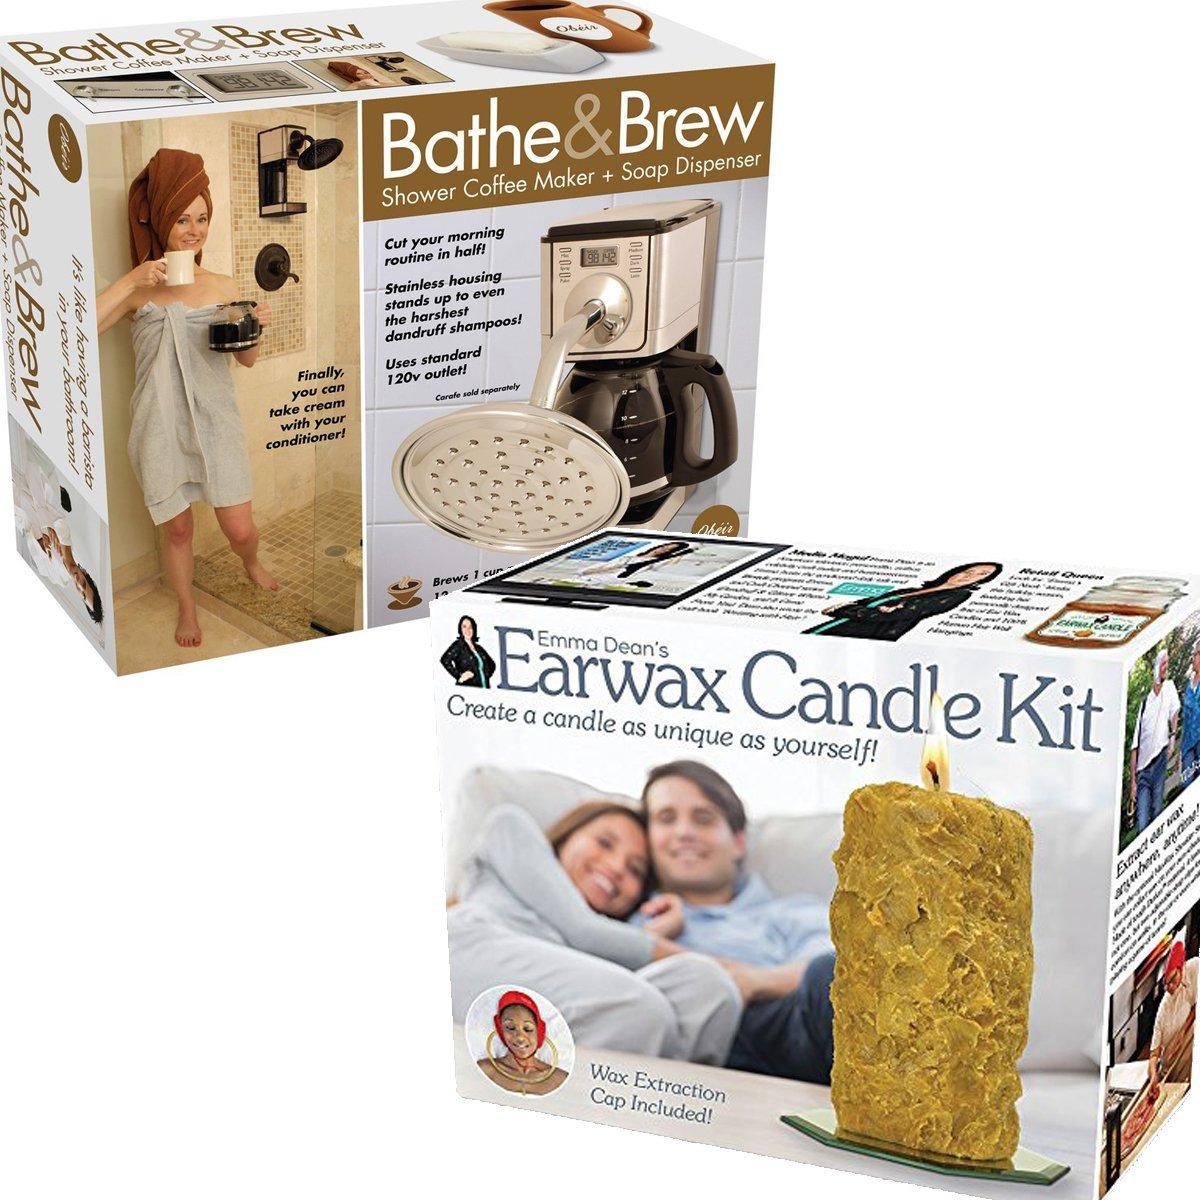 Hilarious Gag Gift Boxes - 2 Prank Pack Funny Box Set - Bathe u0026 Brew -  sc 1 st  Alibaba.com & Buy Hilarious Gag Gift Boxes - 2 Prank Pack Funny Box Set - Bathe ...